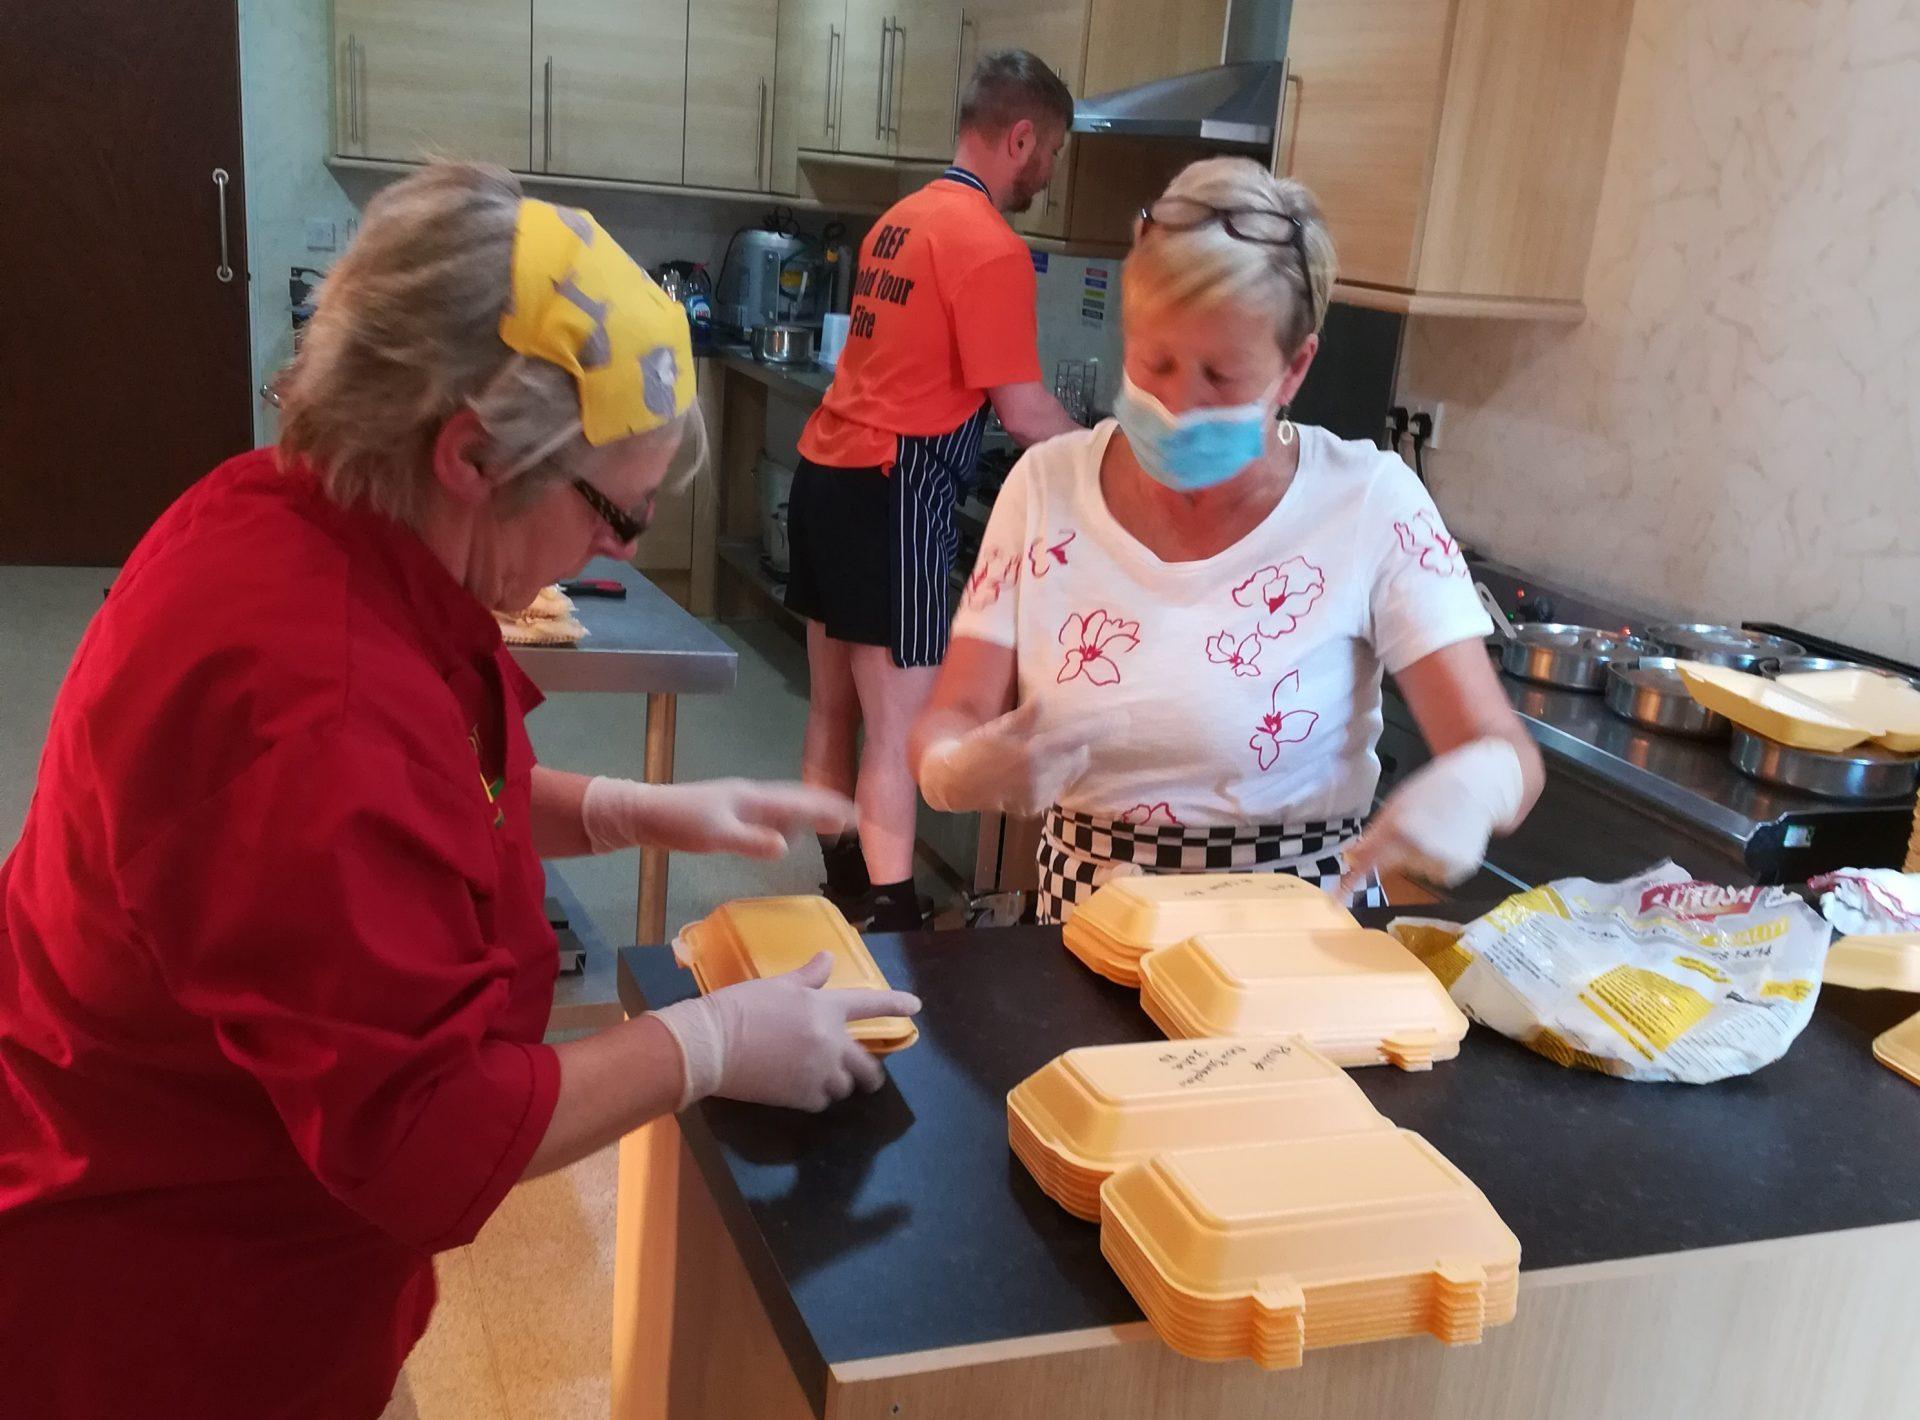 volunteers help fill food packs during coronavirus crisis